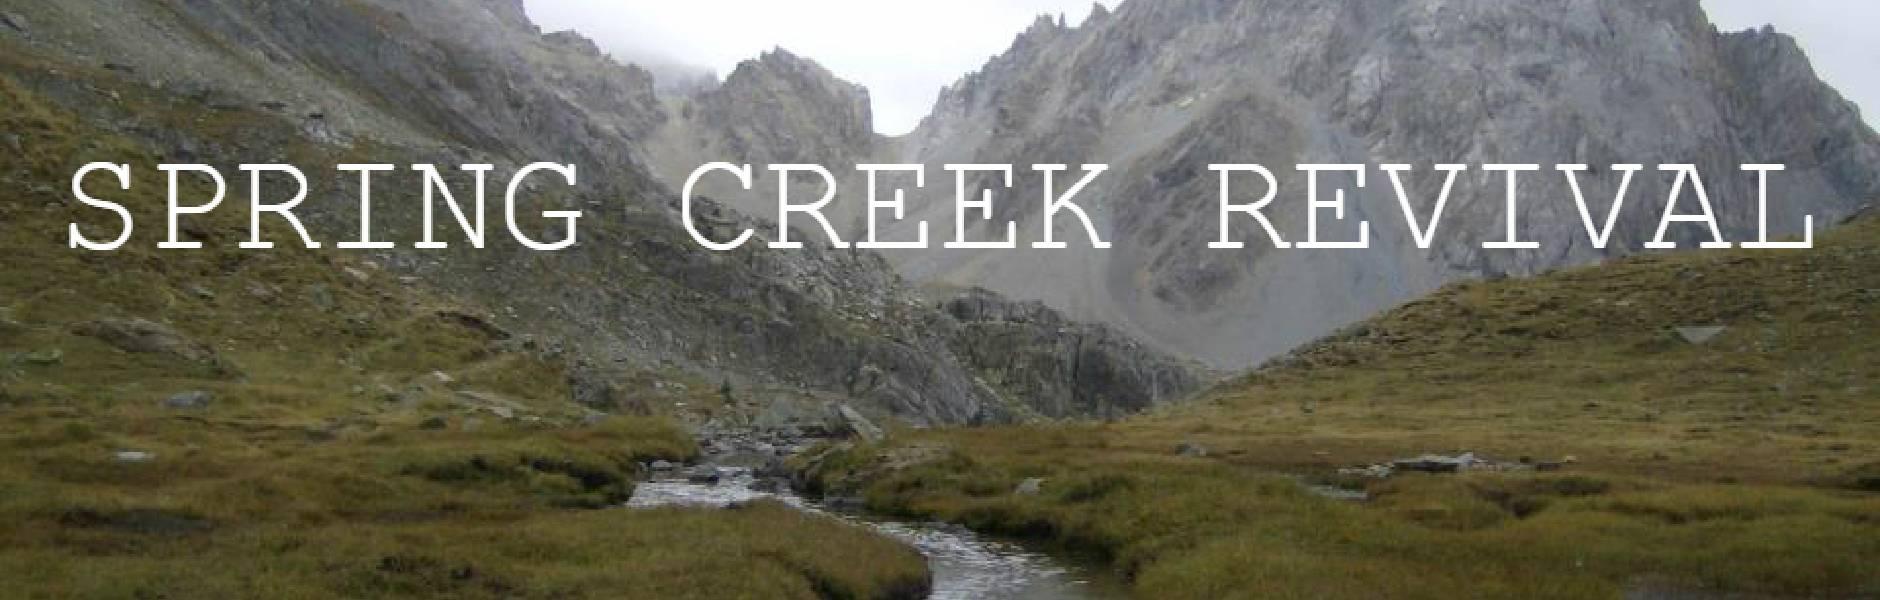 Spring Creek Revival